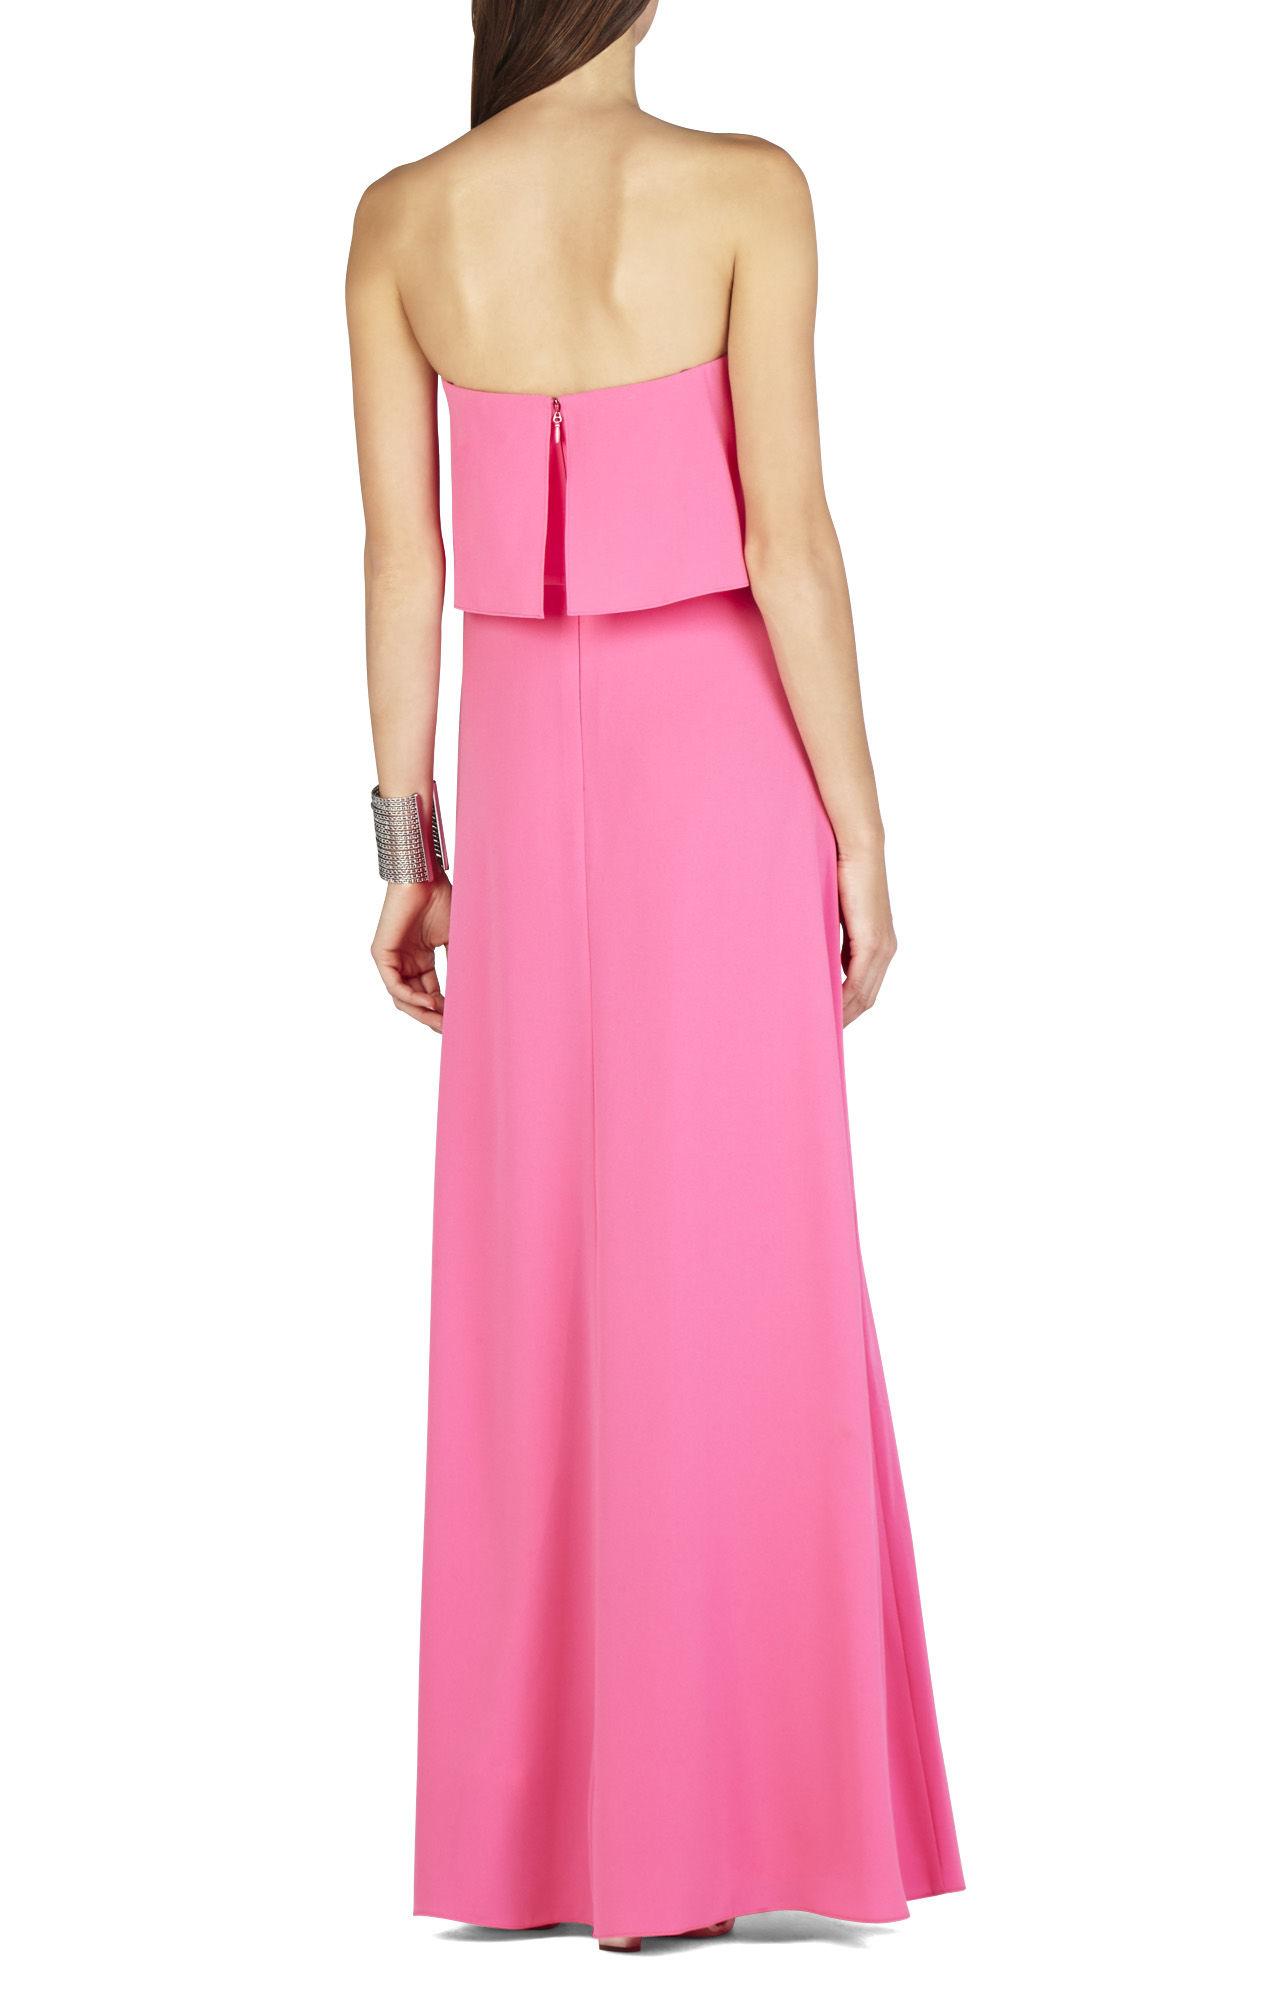 49ac29d0e64c BCBGMAXAZRIA Alyse Strapless Overlay Gown in Pink - Lyst